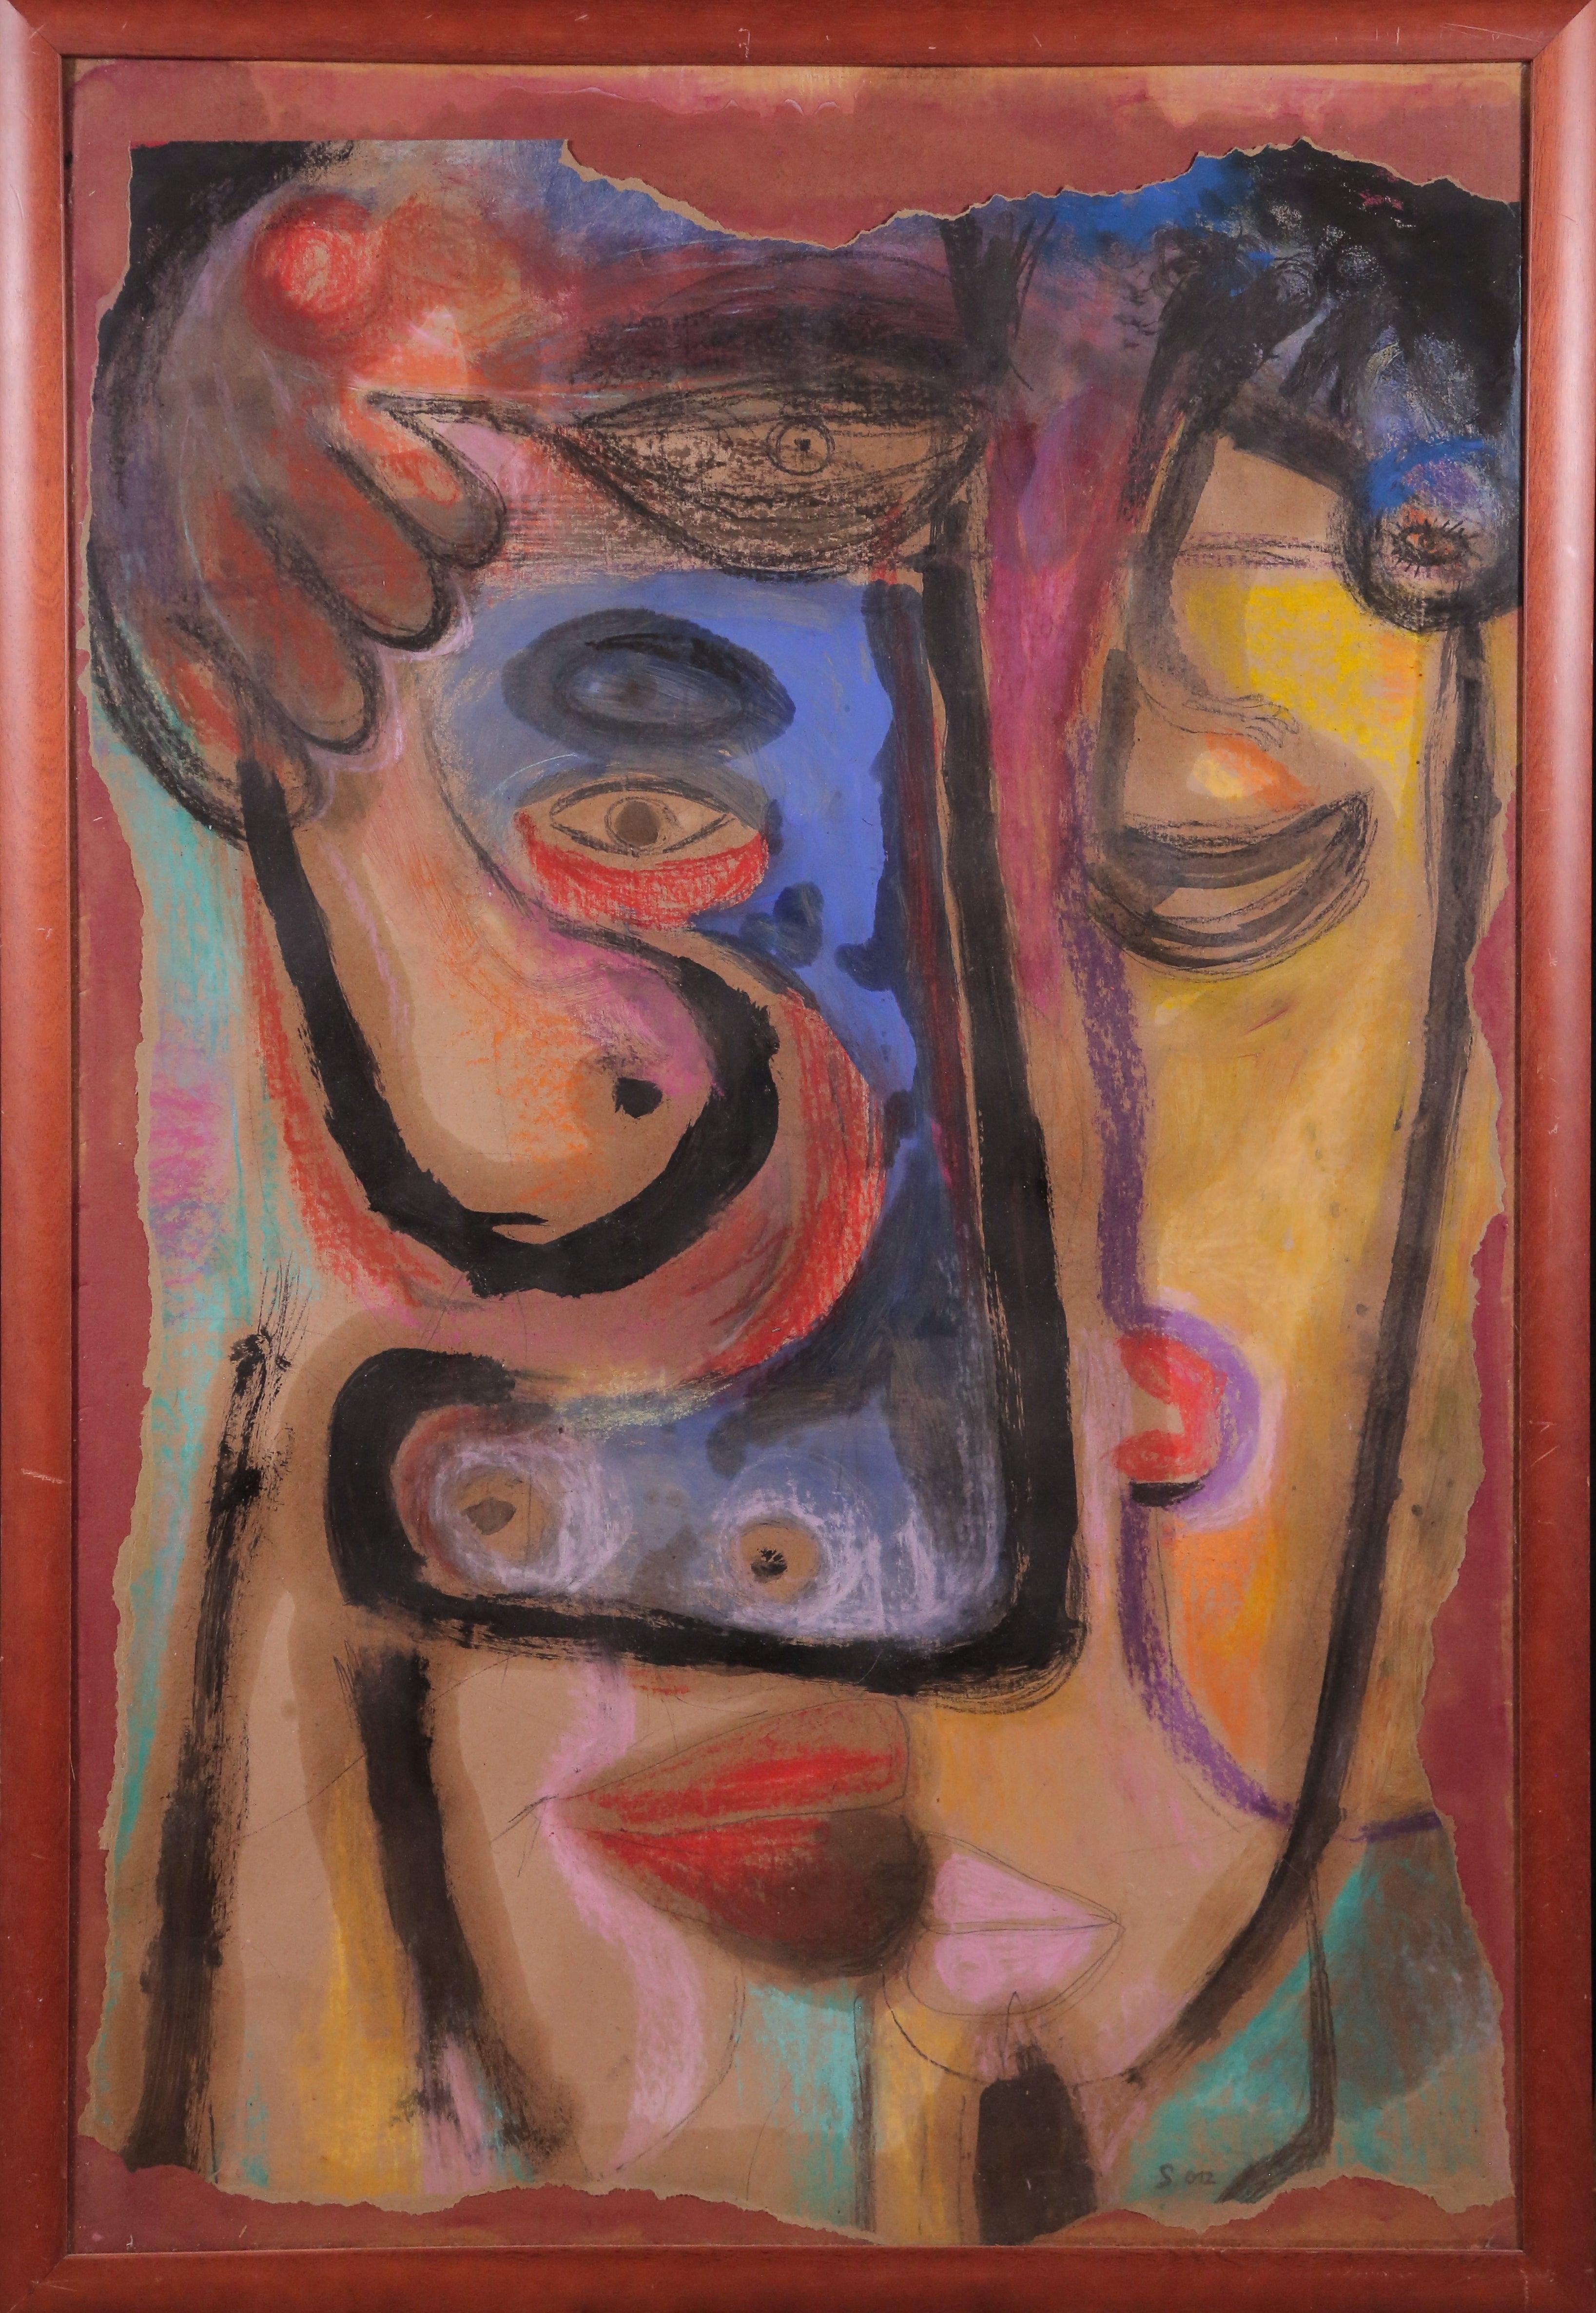 Dreamer II, Szilard Szilagyi, Abstract Expressionist Mixed media, Portrait, Red